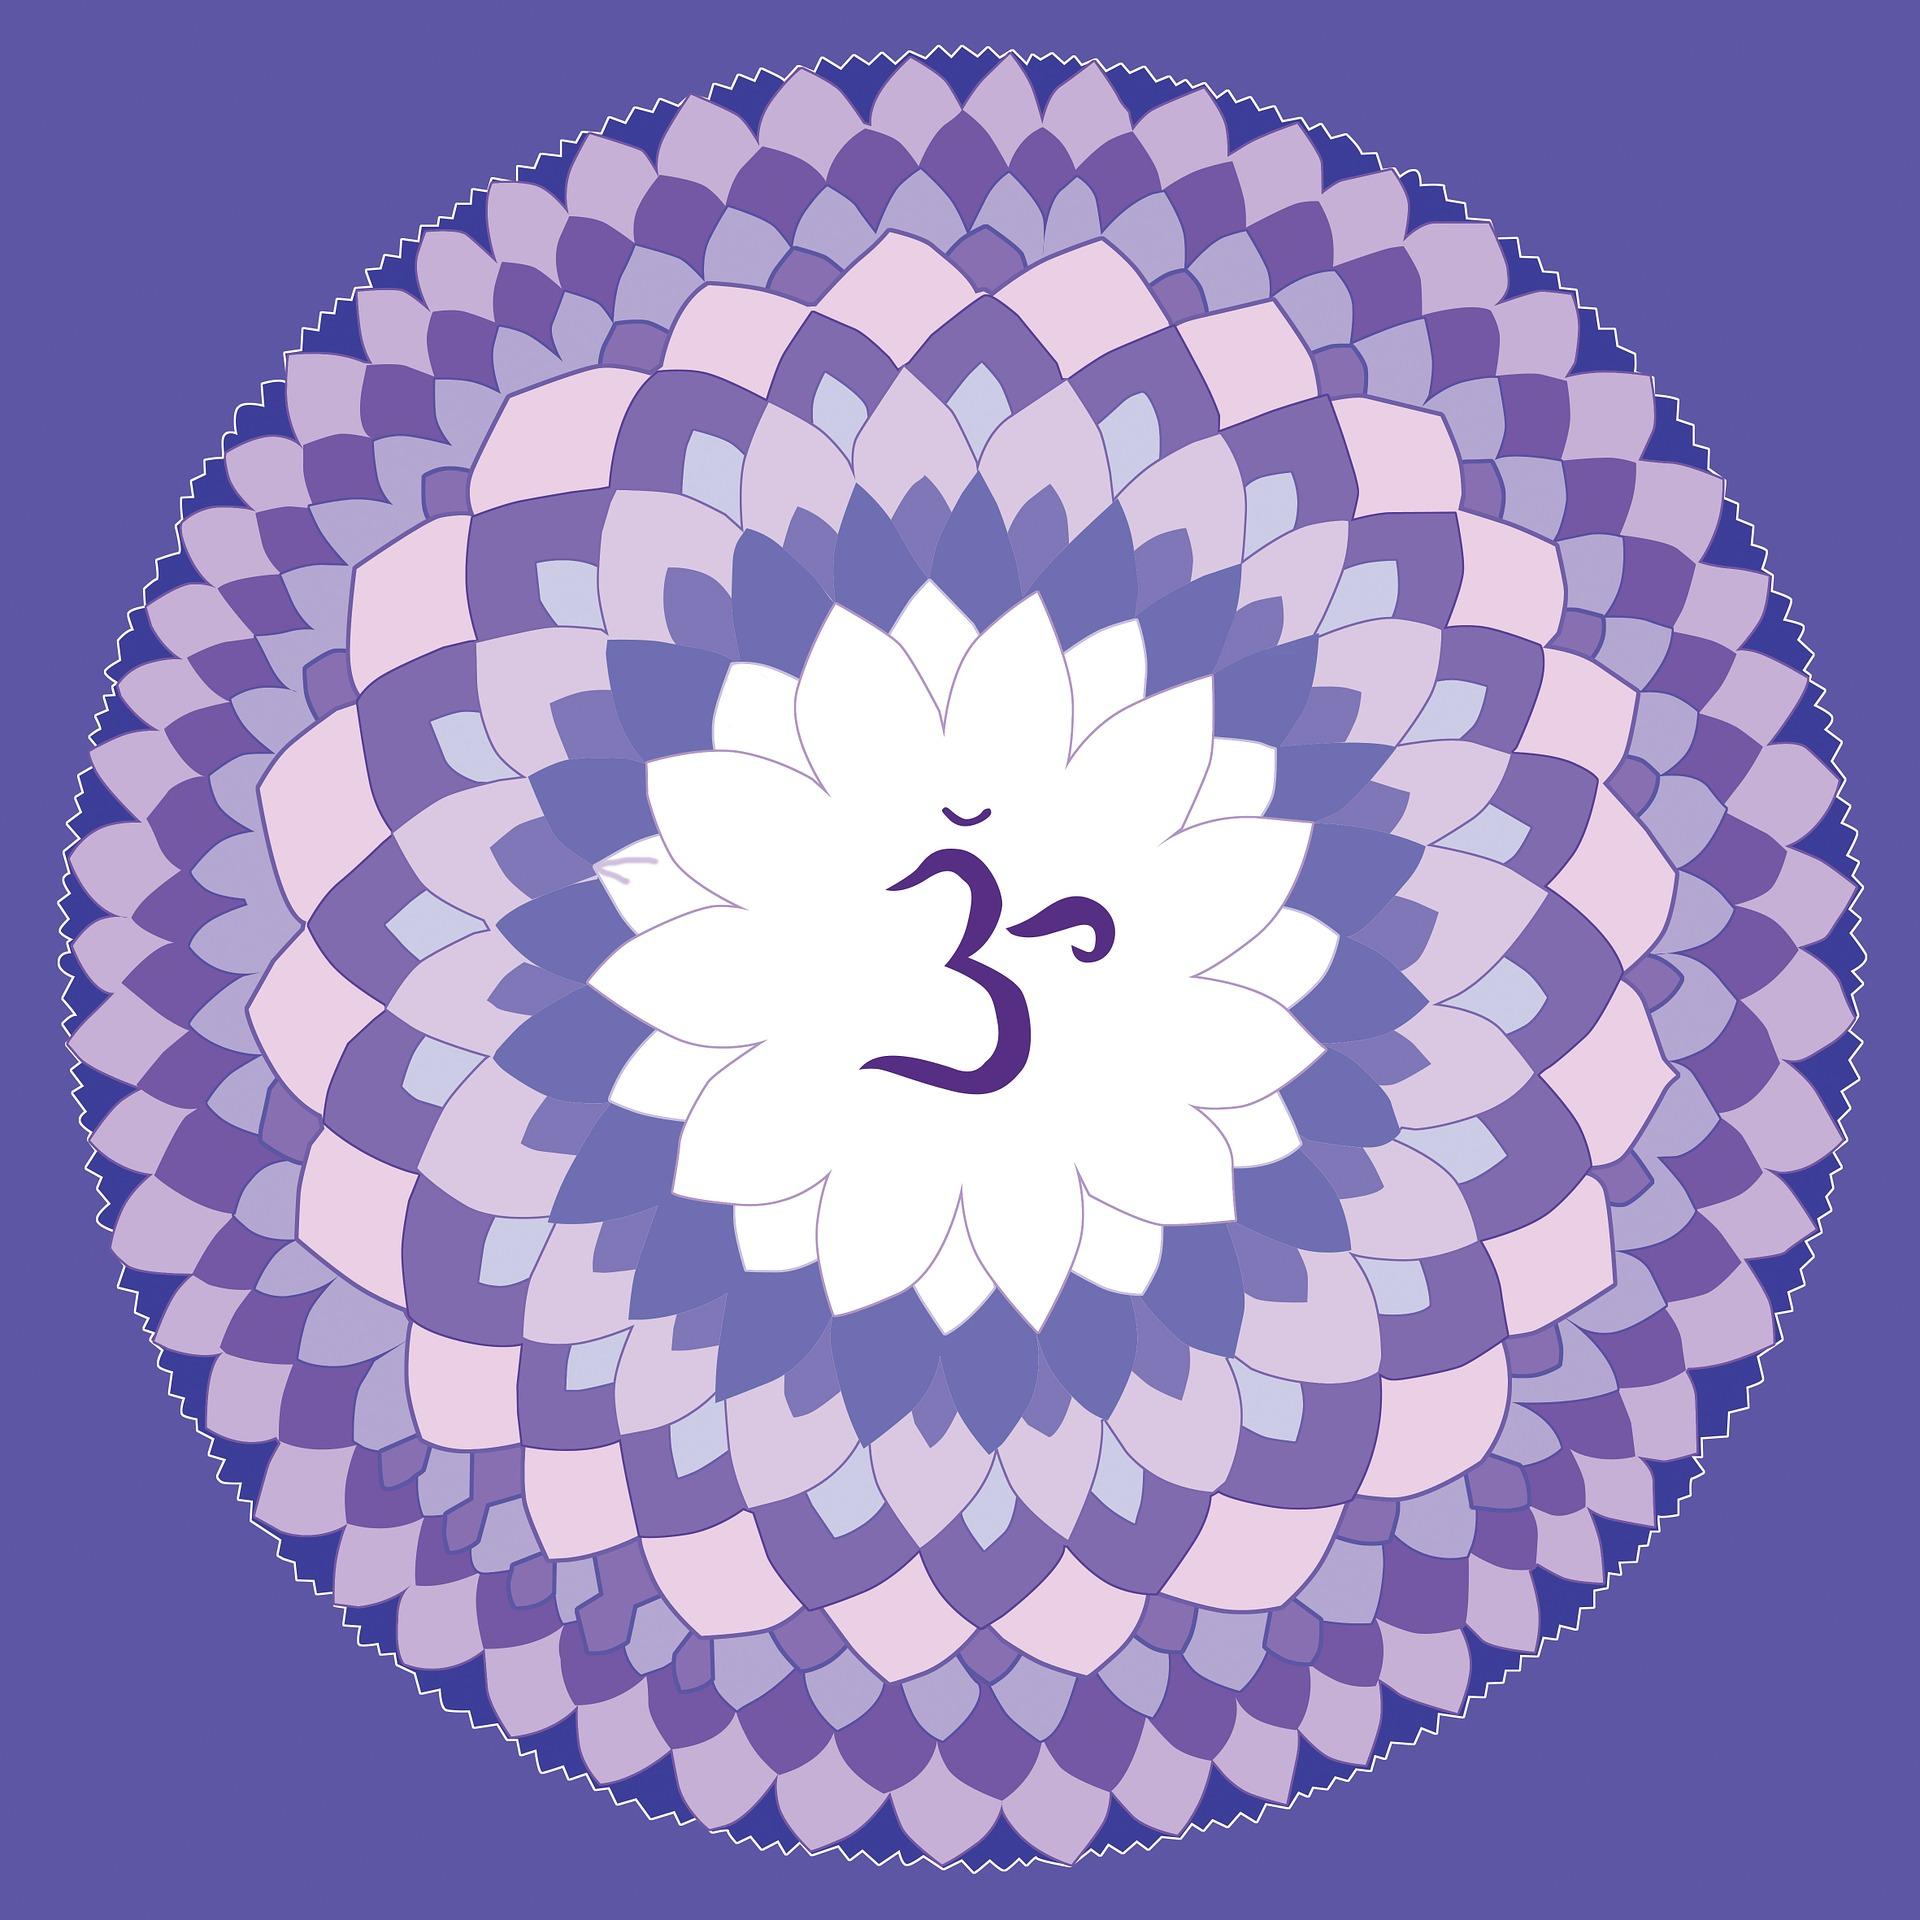 simboluri si semnificatii - lotus - mandala - sfatulparintilor.ro - pixabay_com - violet-1340083_1920